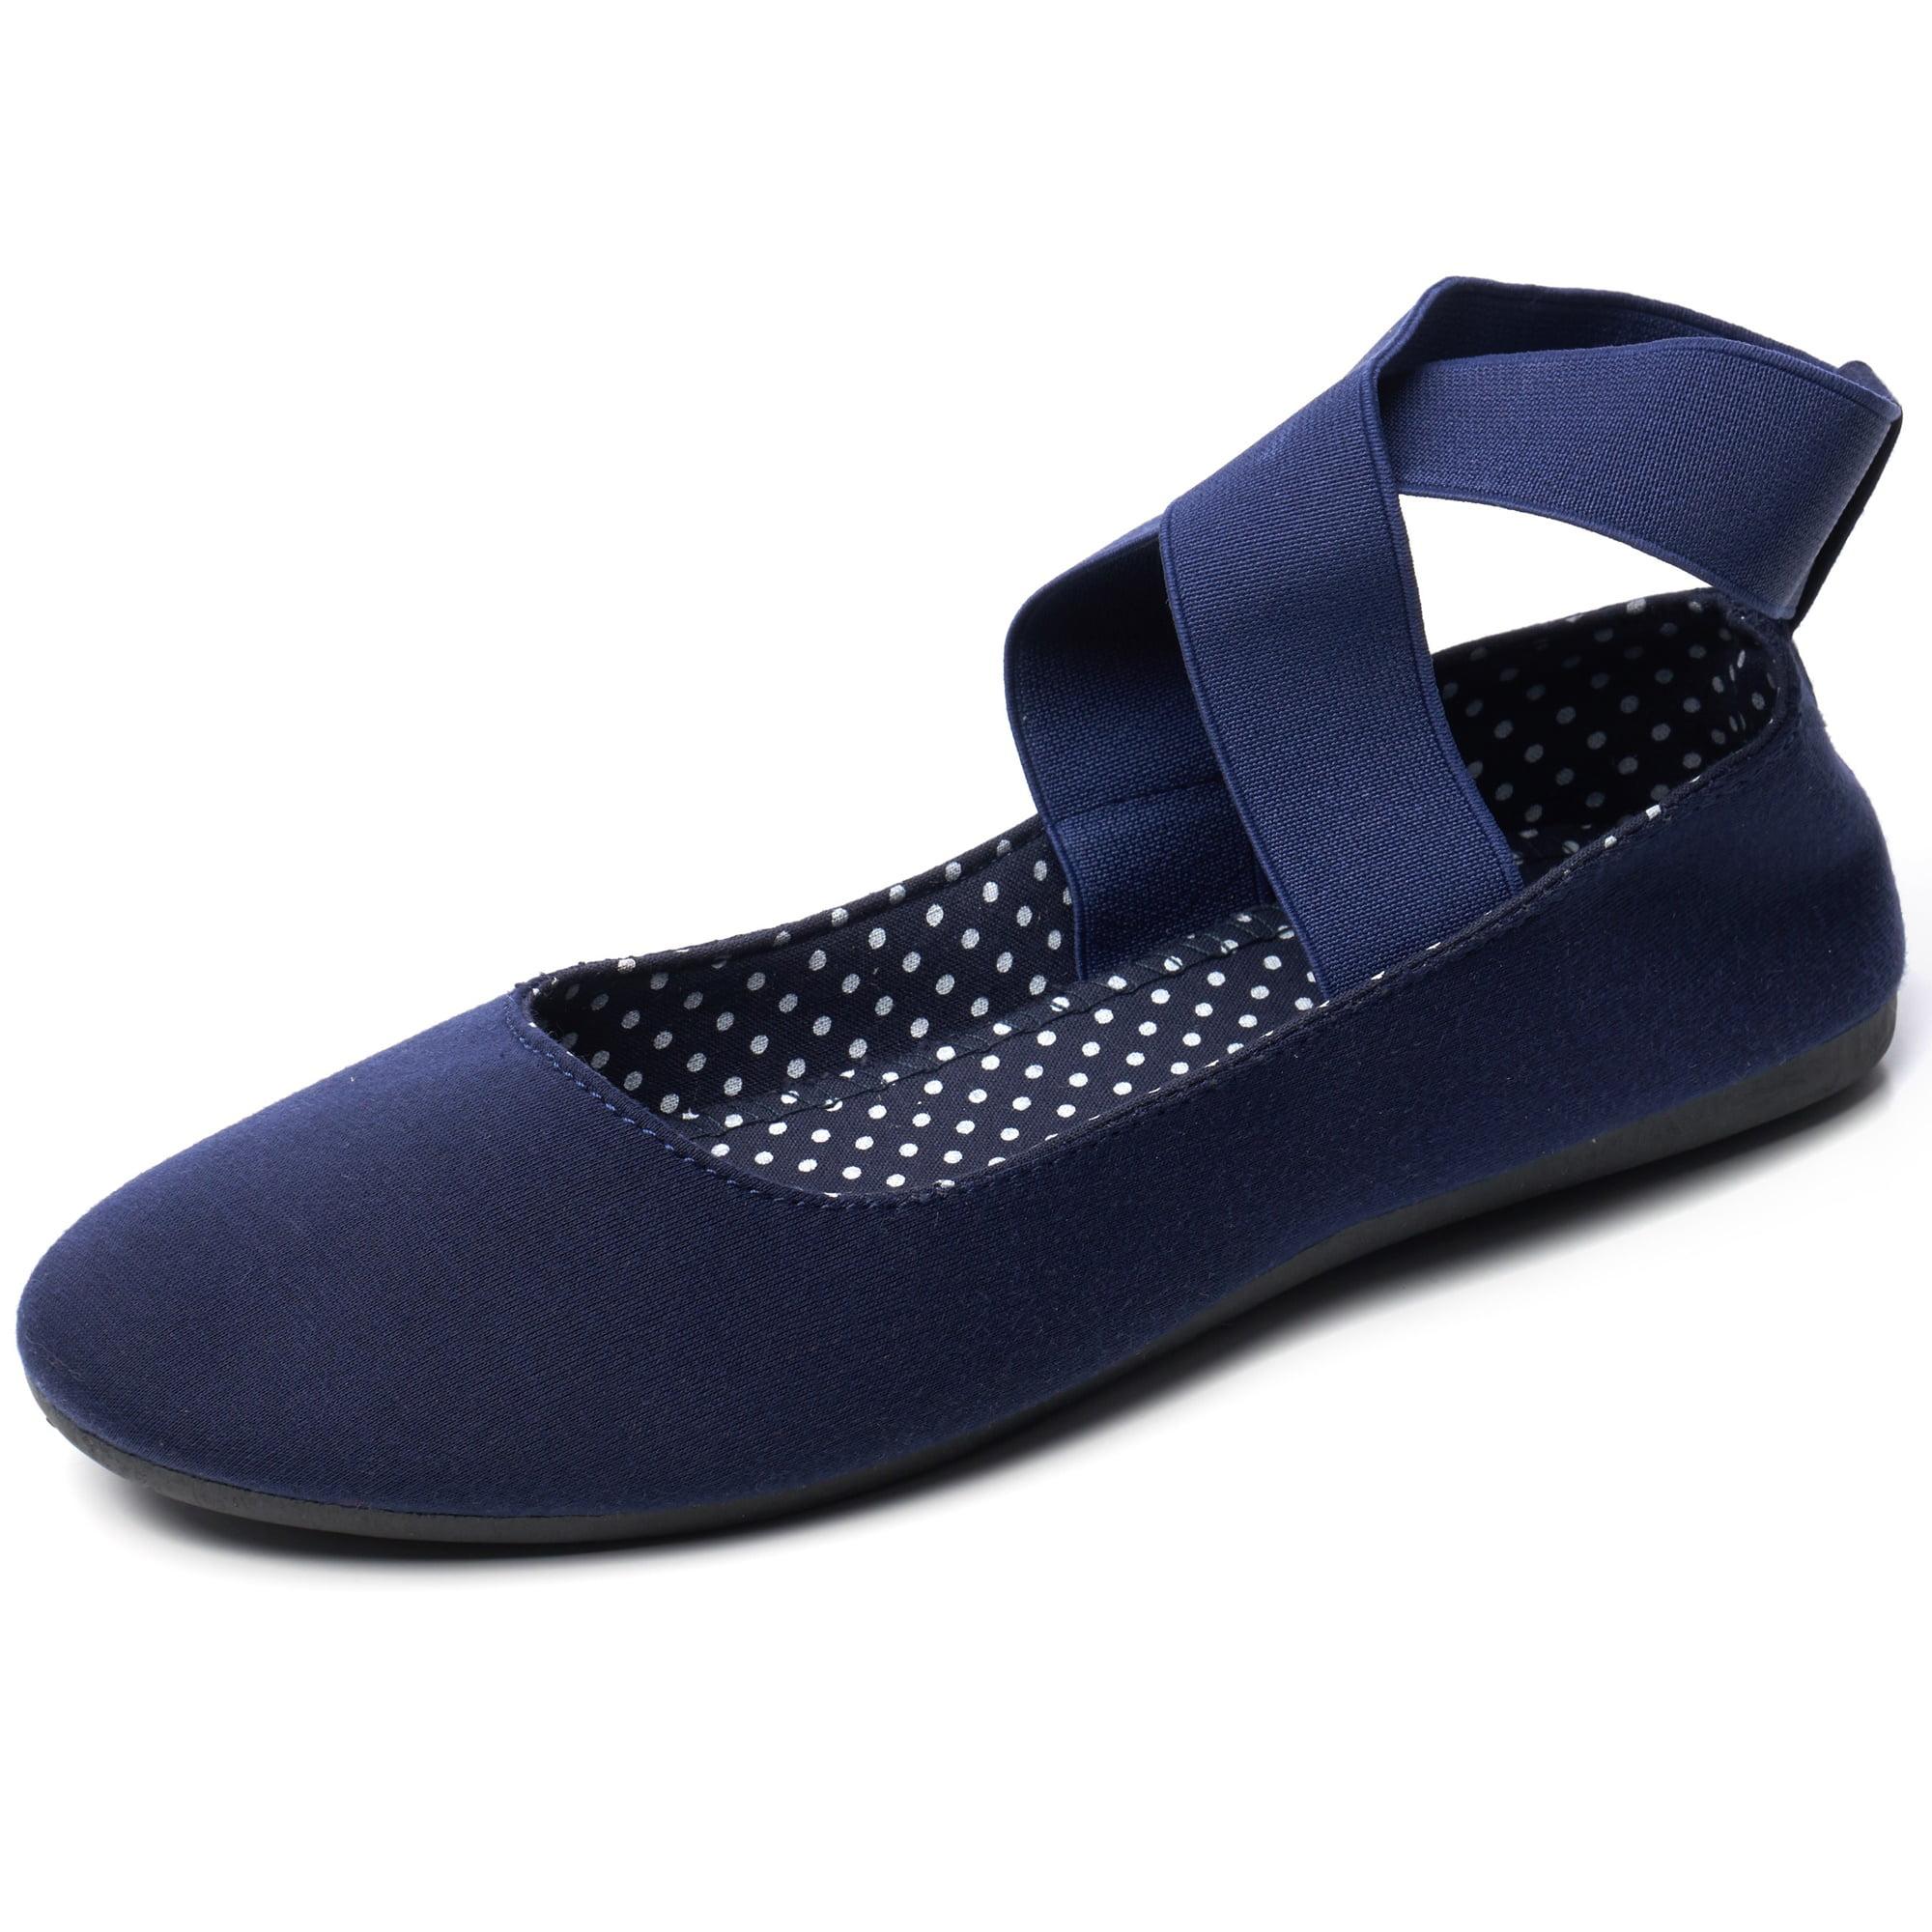 Blue All Womens Flats - Walmart.com